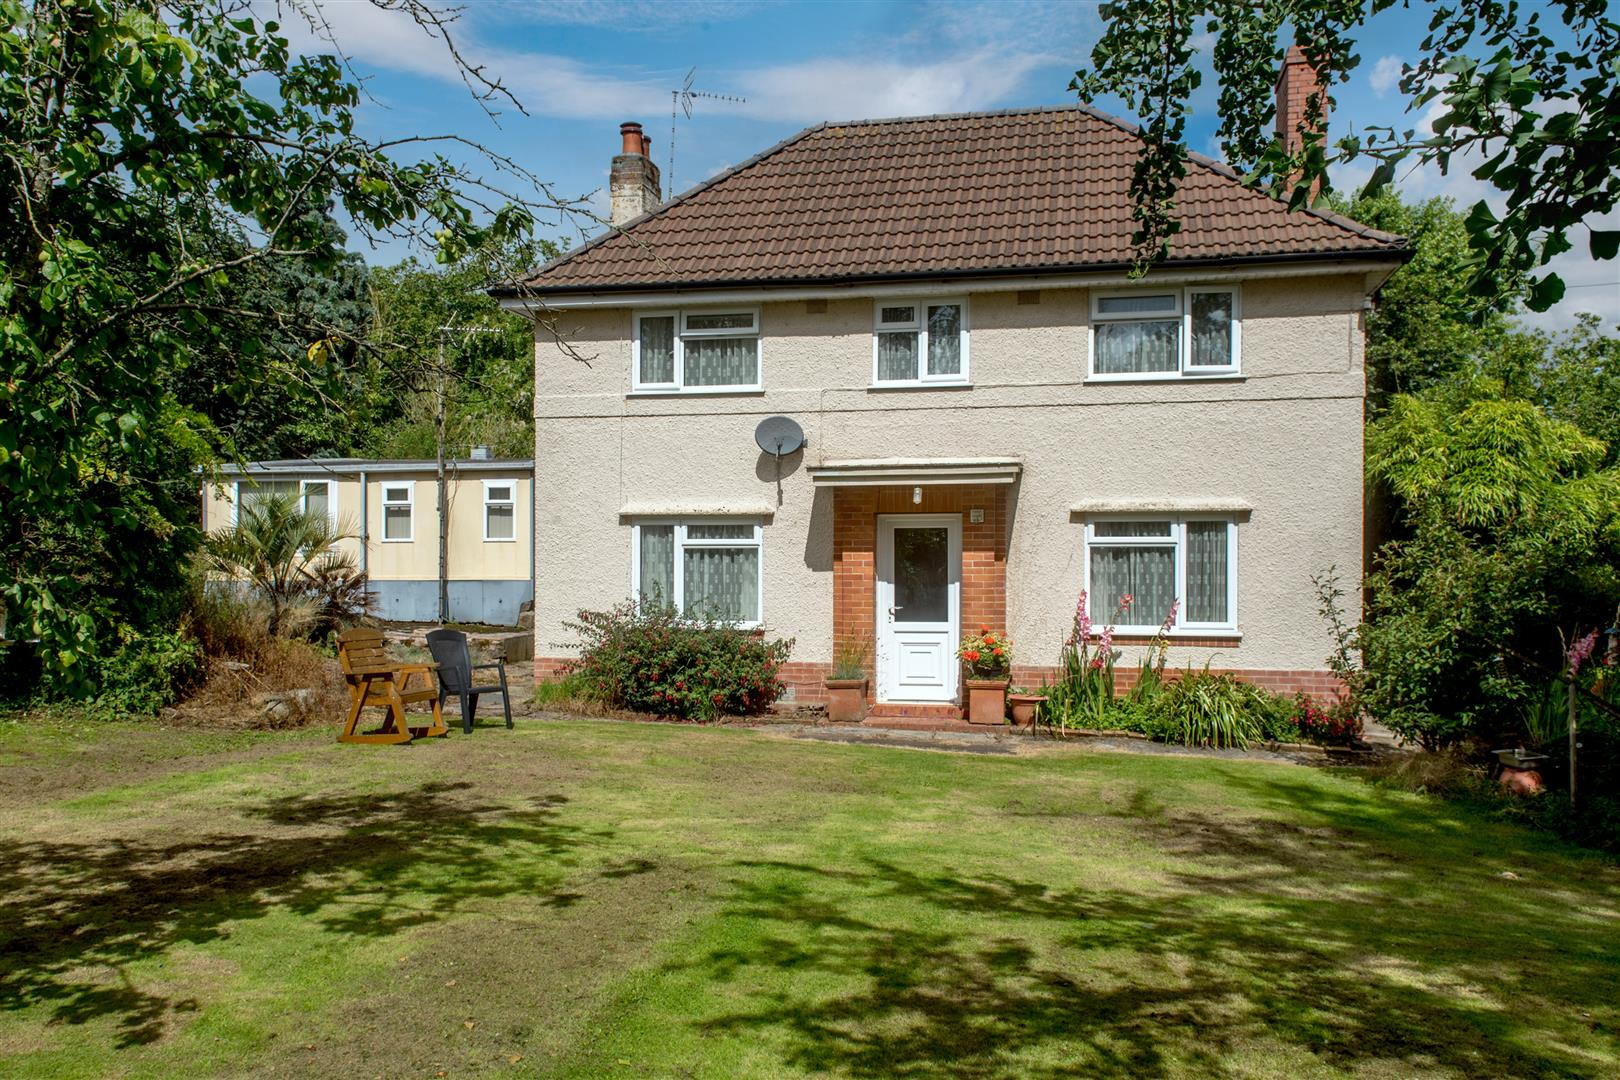 Whitmore Lane, Staplegrove, Taunton